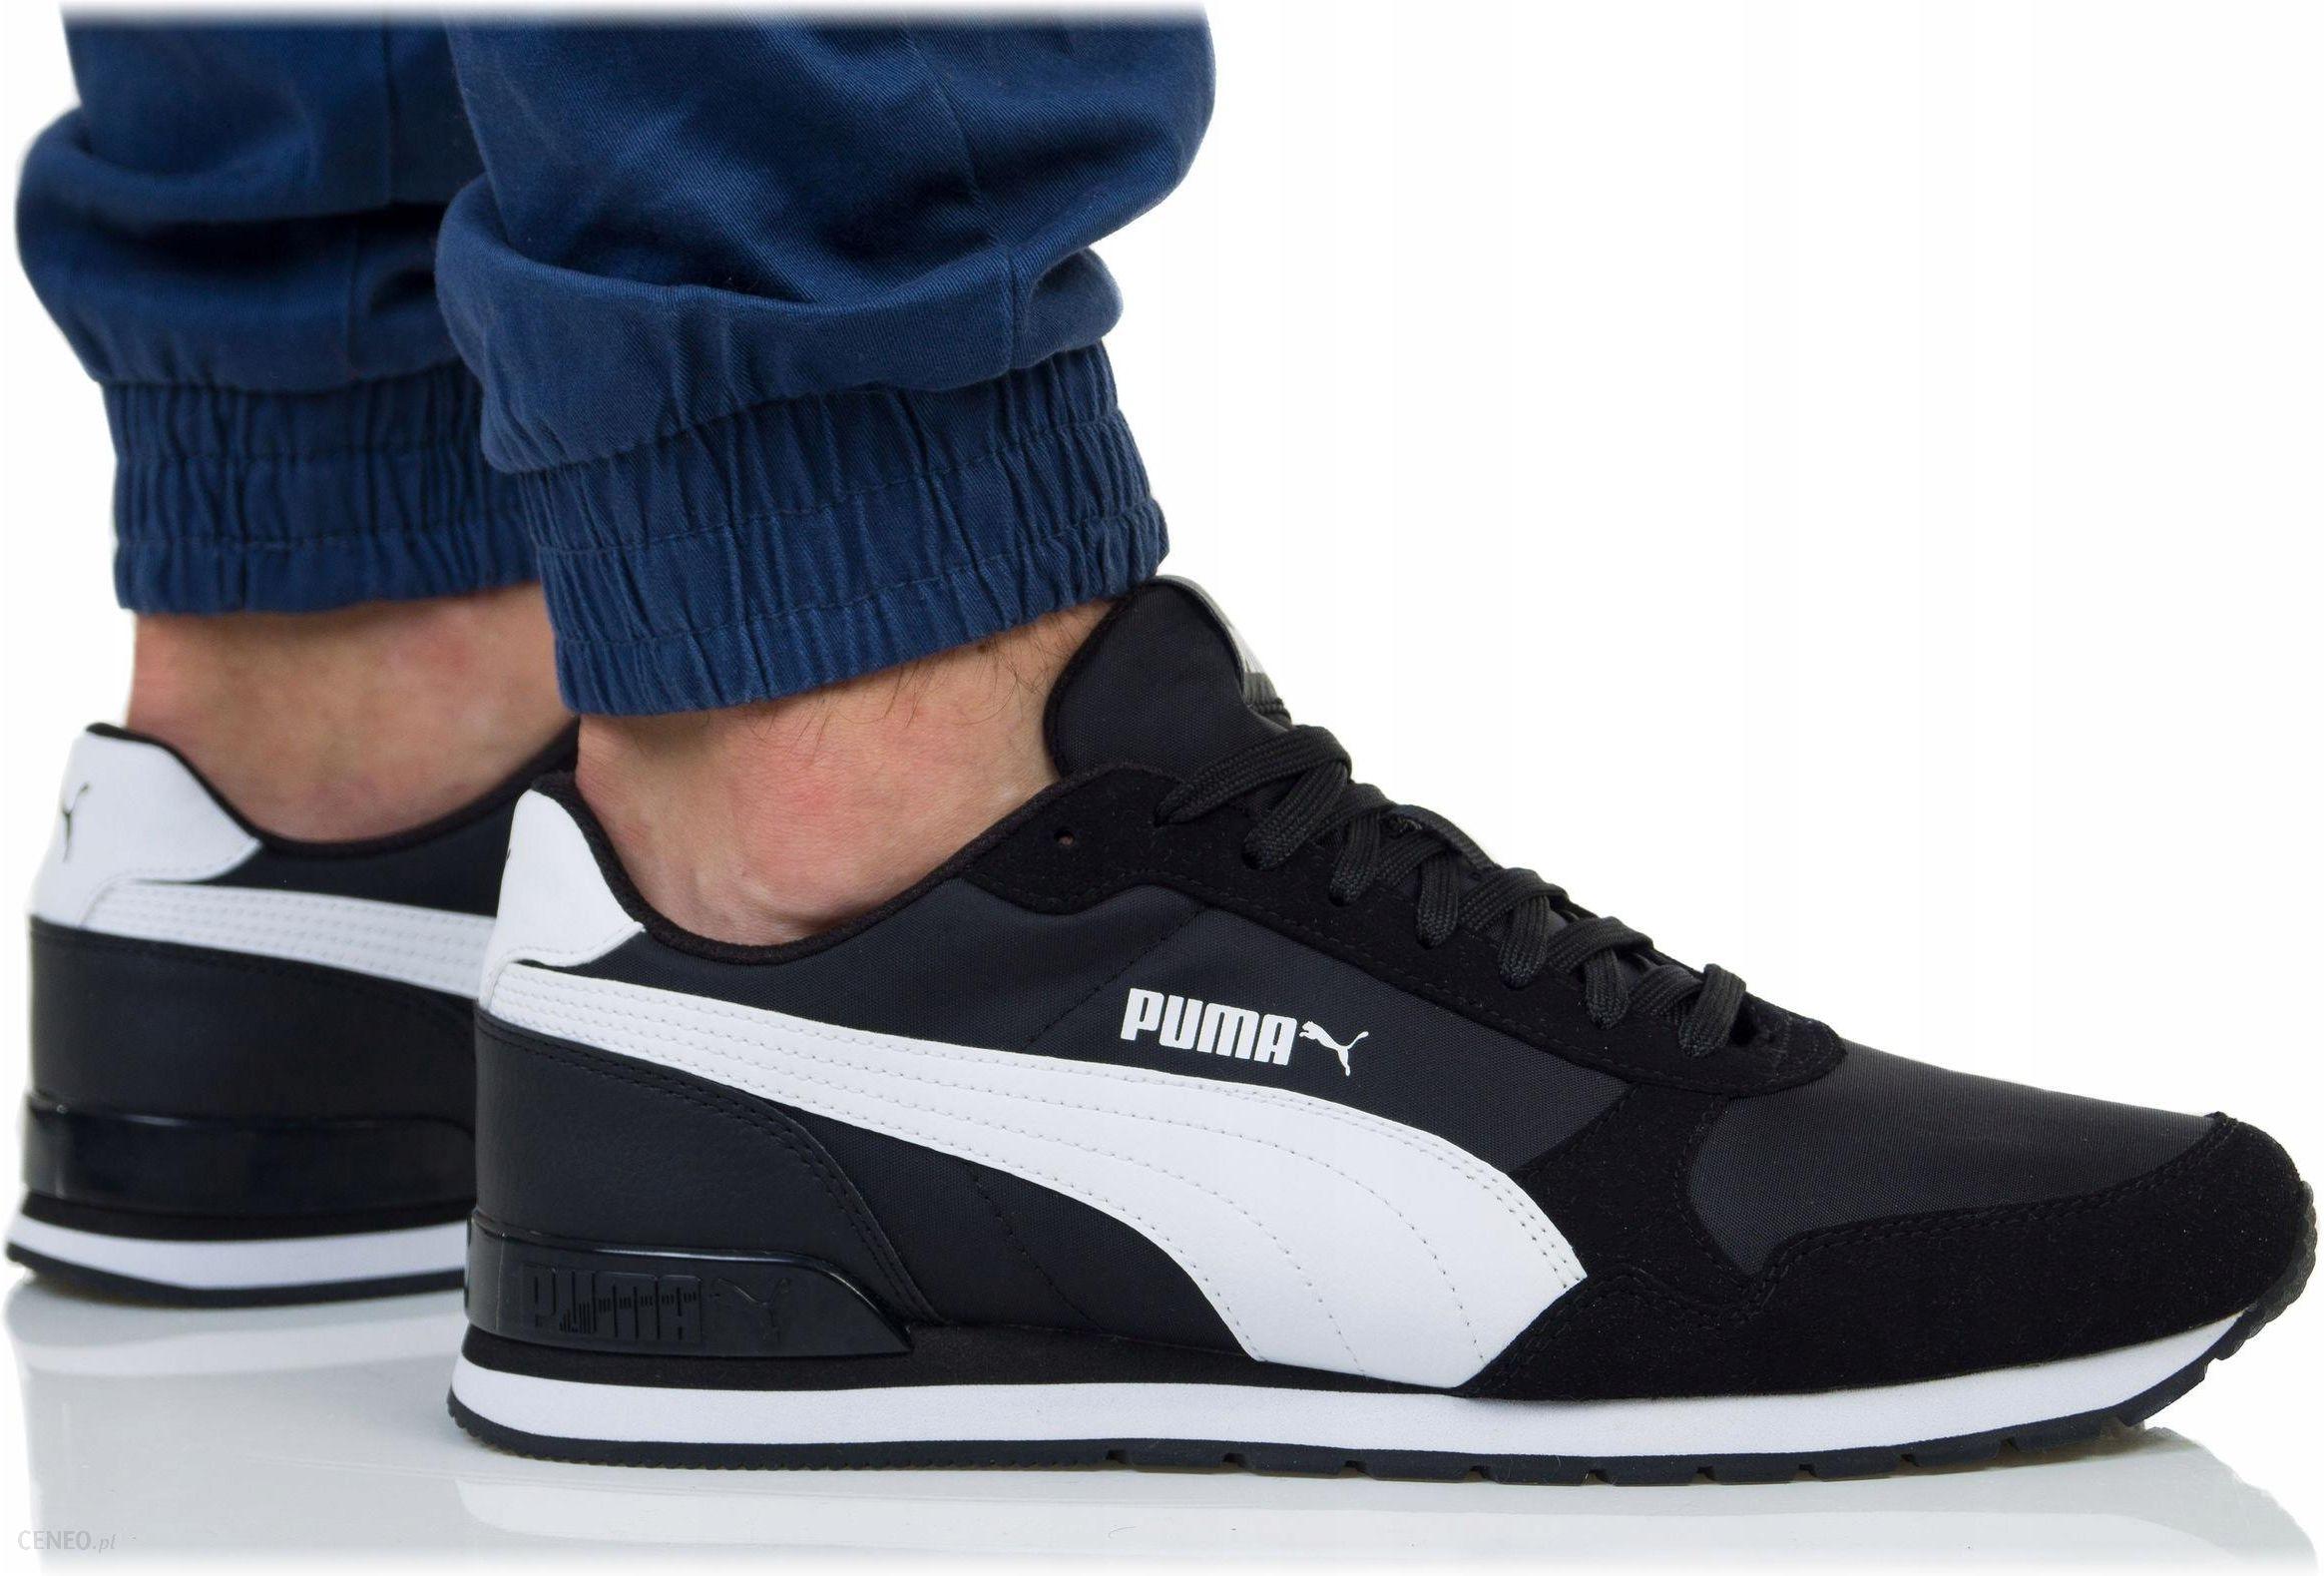 Buty Puma Męskie St Runner V2 Nl 365278 01 Czarne Ceny i opinie Ceneo.pl